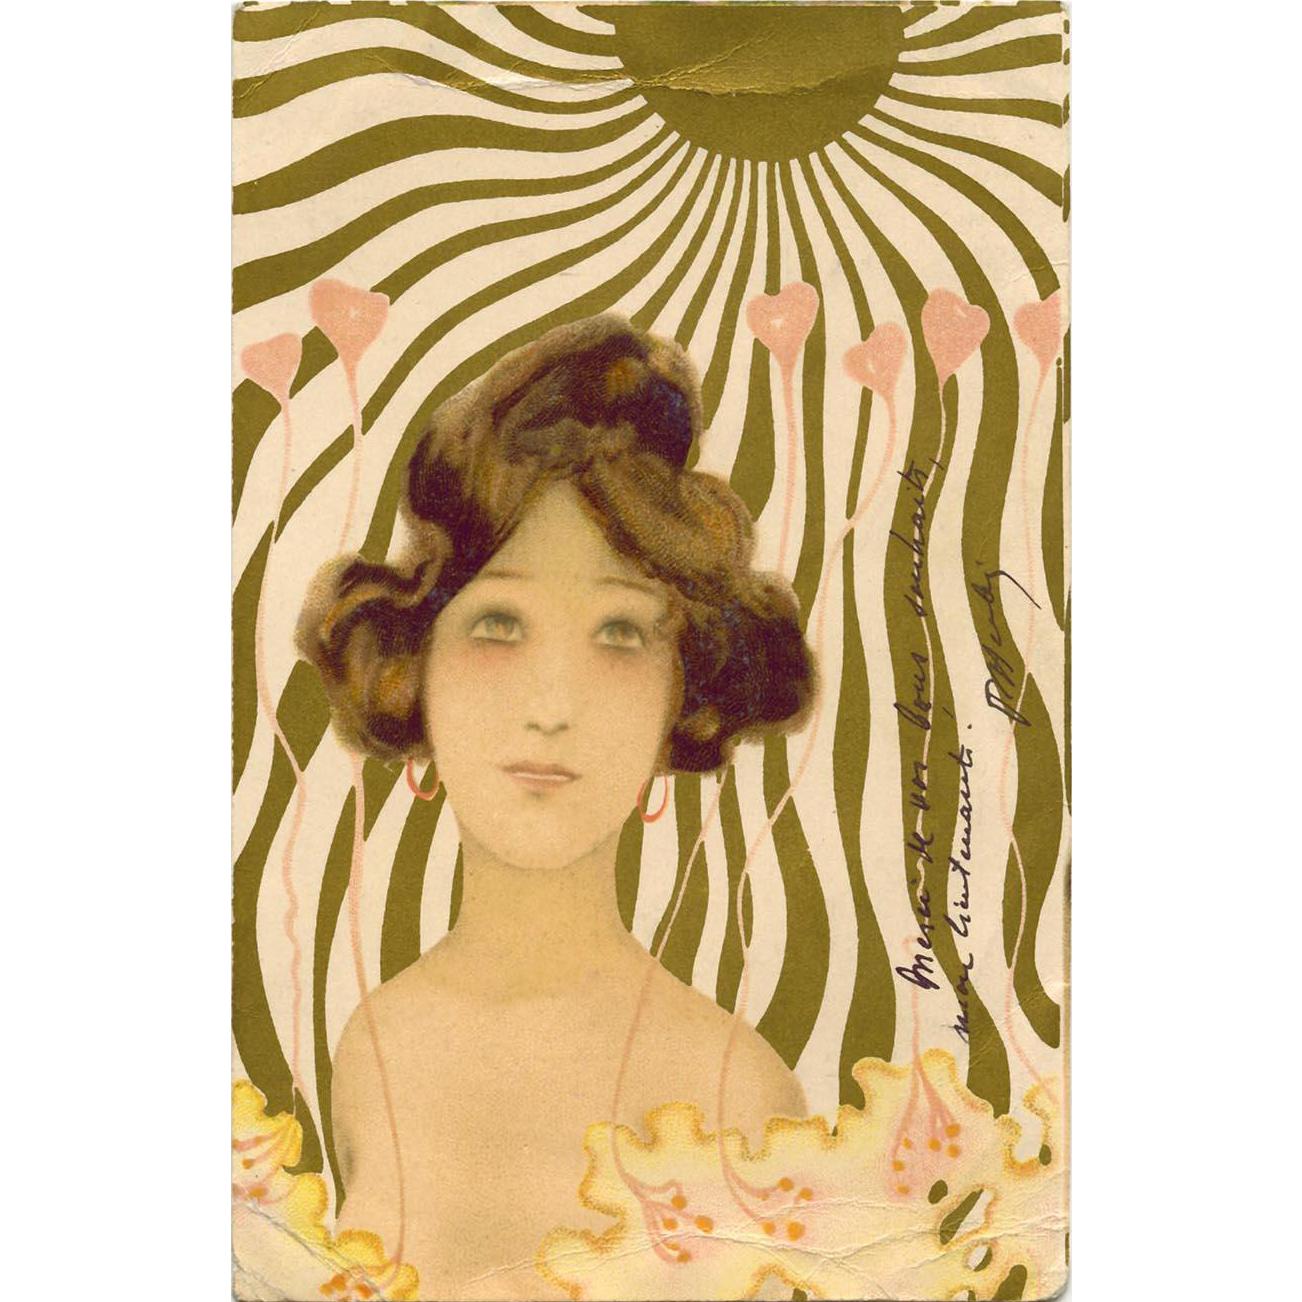 Raphael Kirchner Art Nouveau Postcard Femmes Soleil Series Mailed 1902